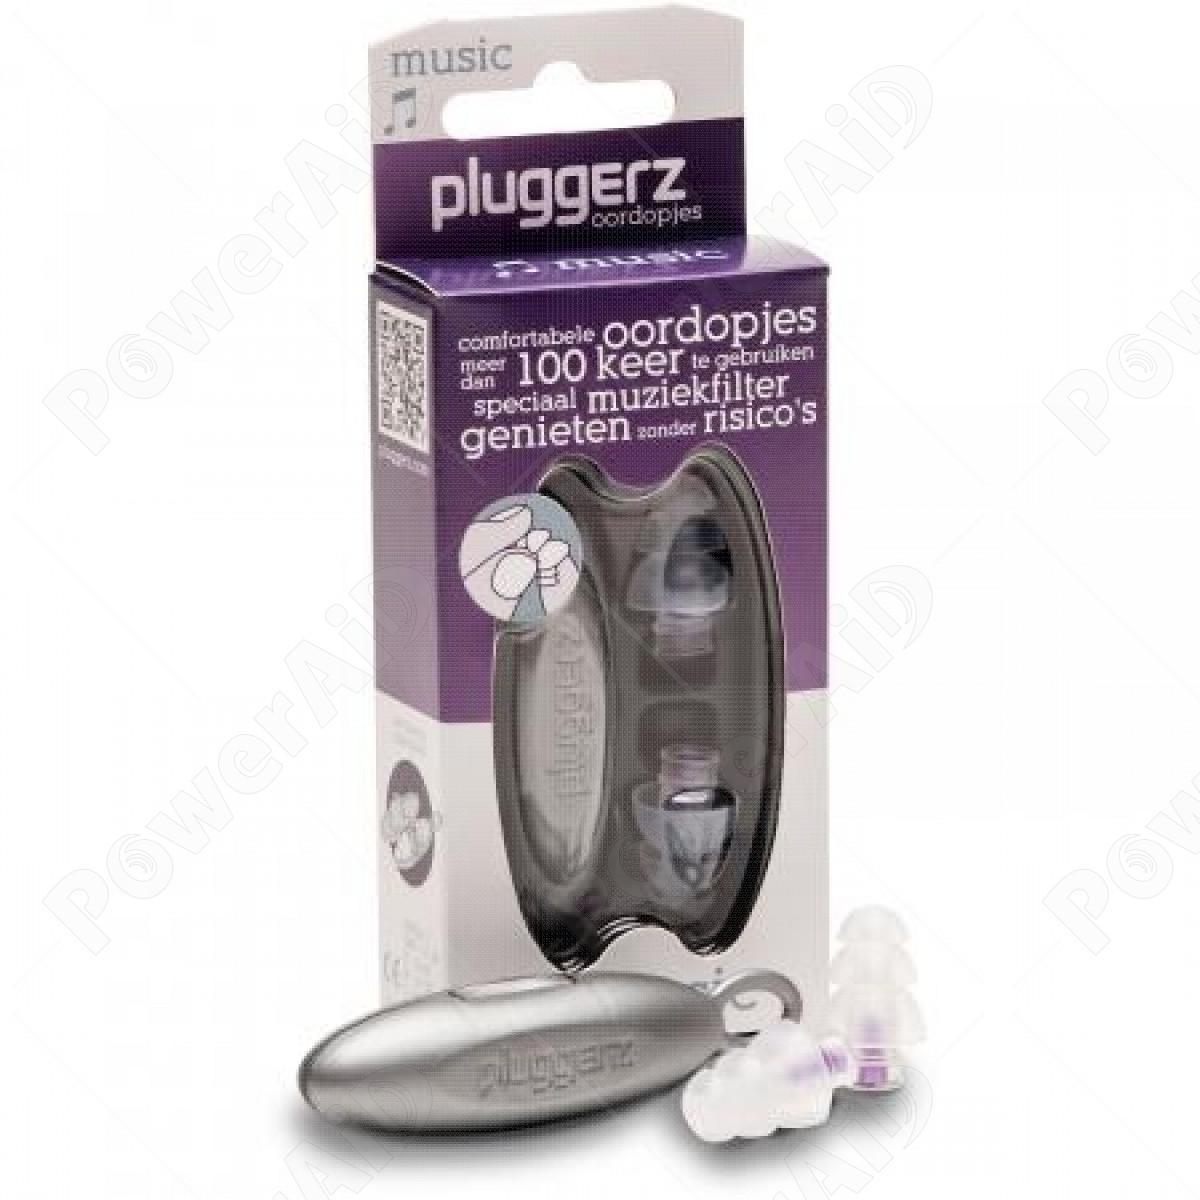 Pluggerz - Music